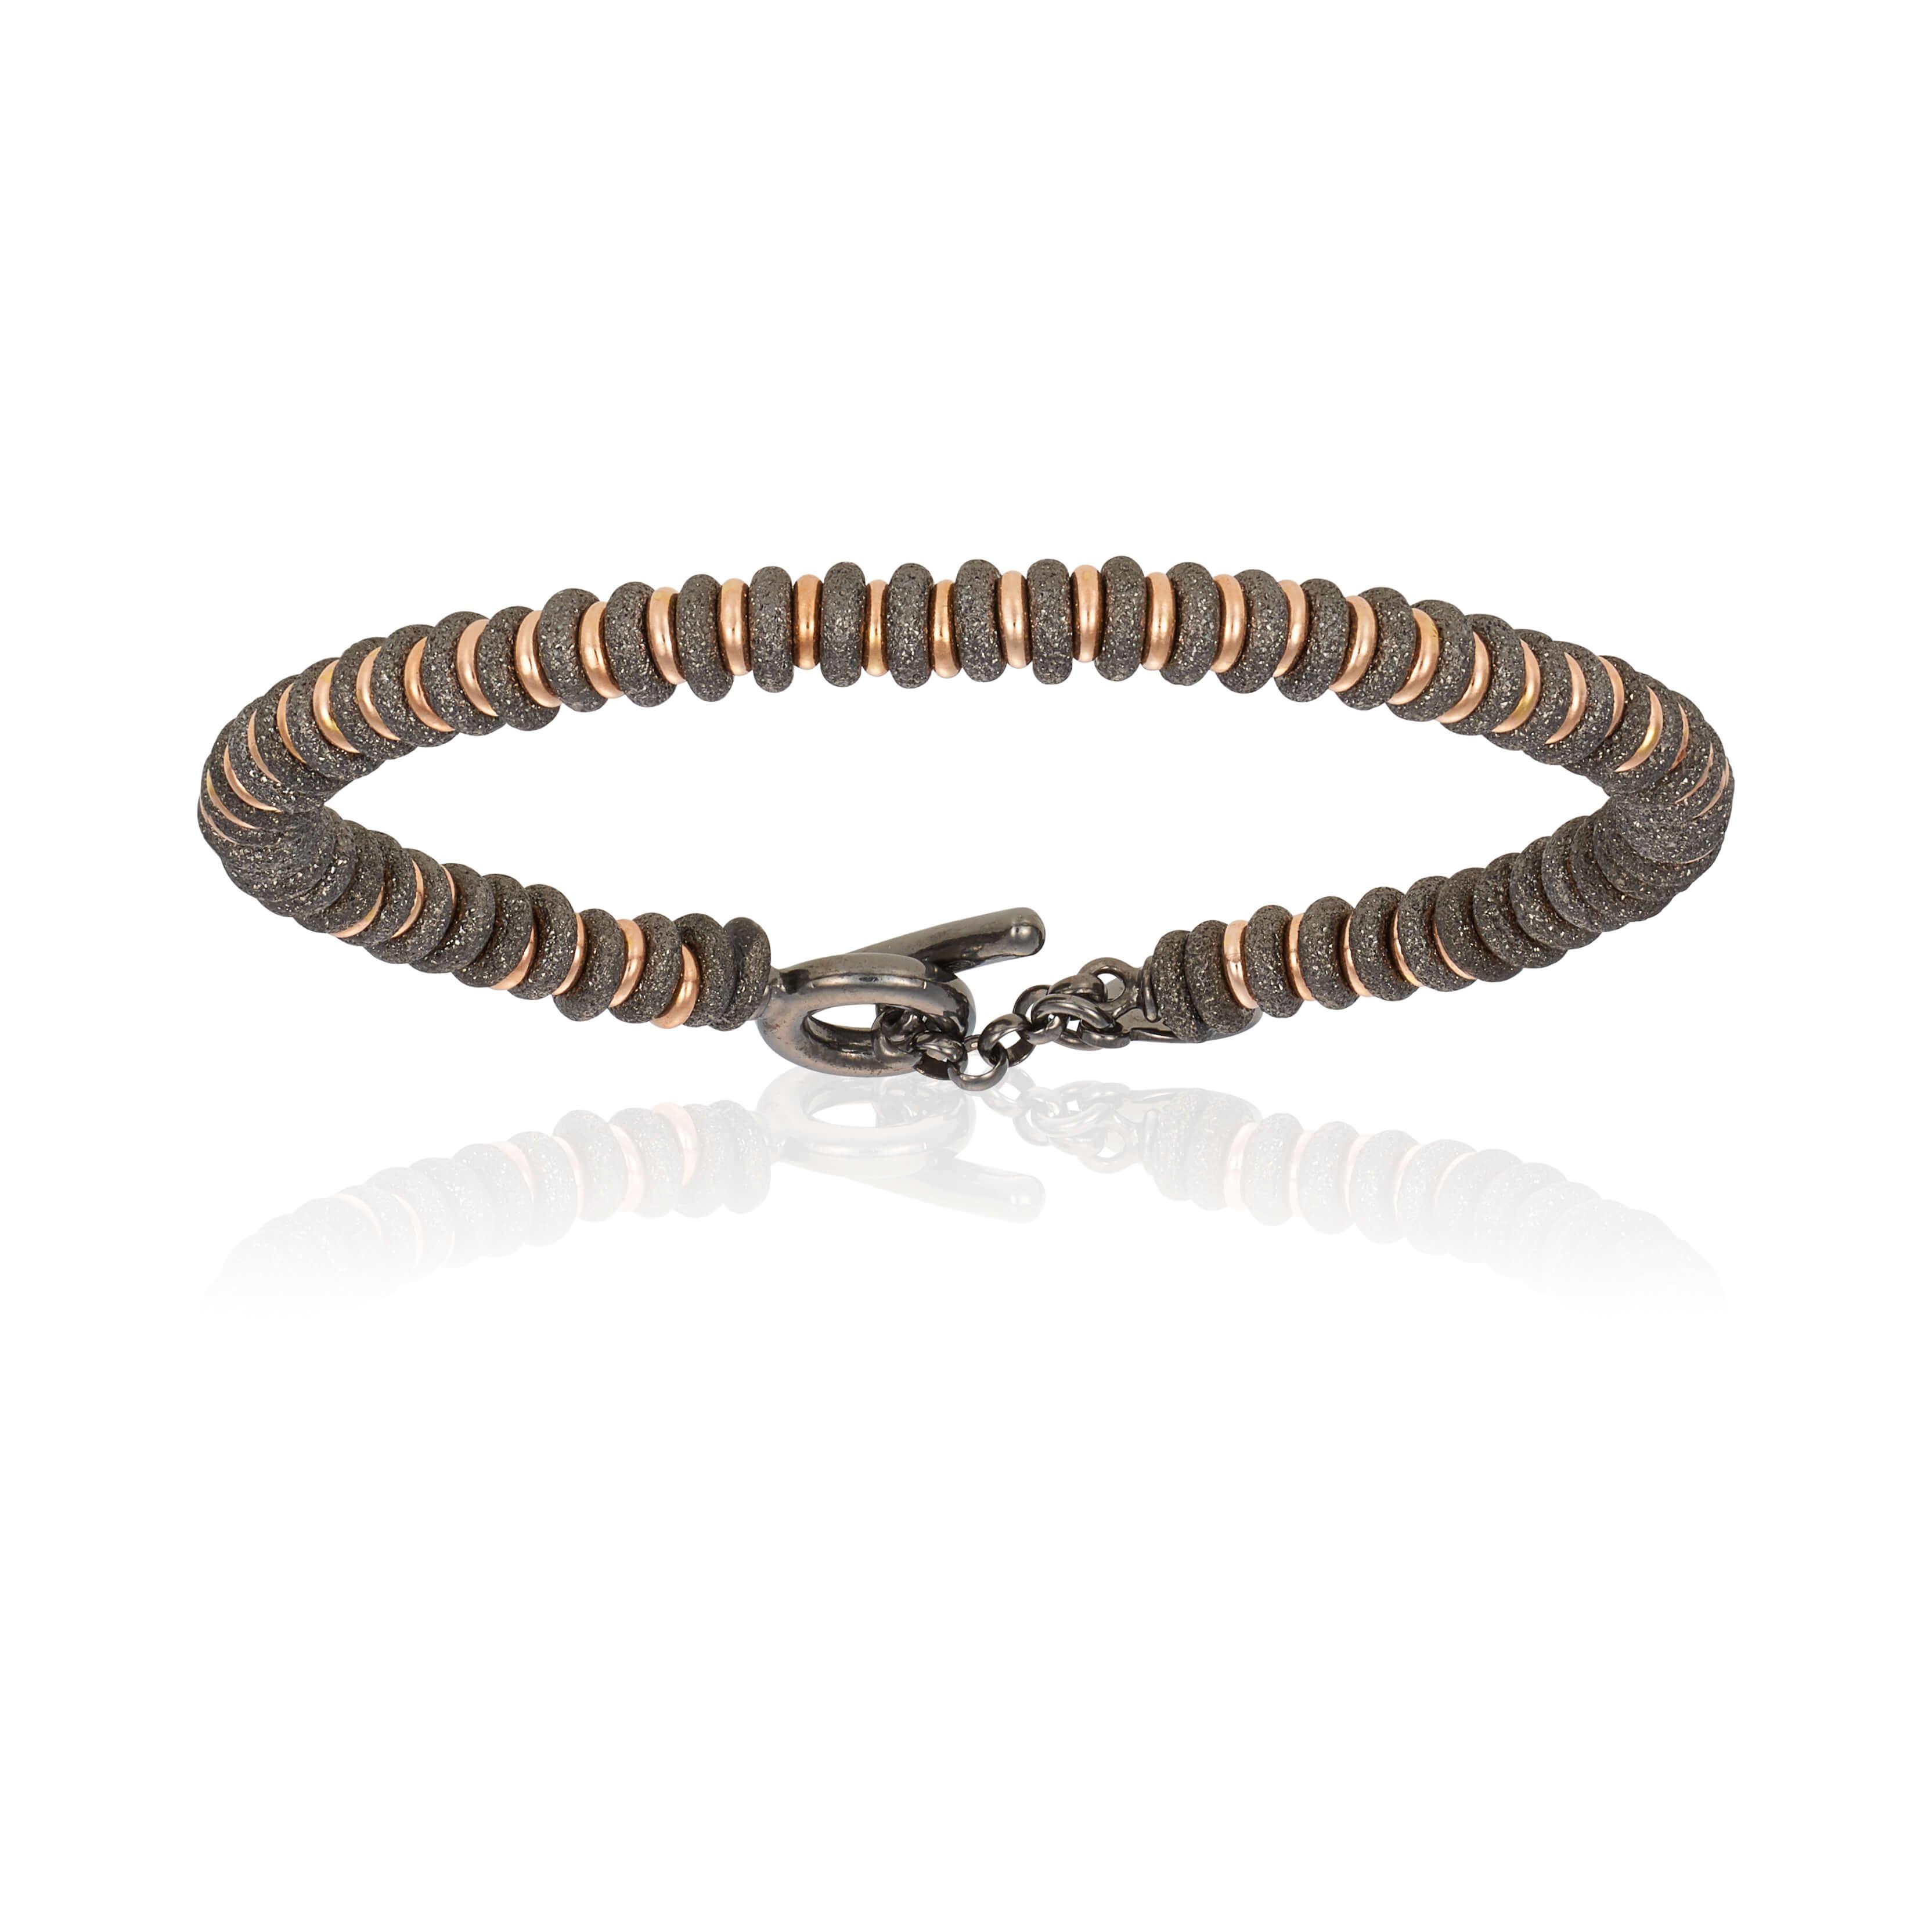 Black PVD bracelet with rose gold beads (Unisex)